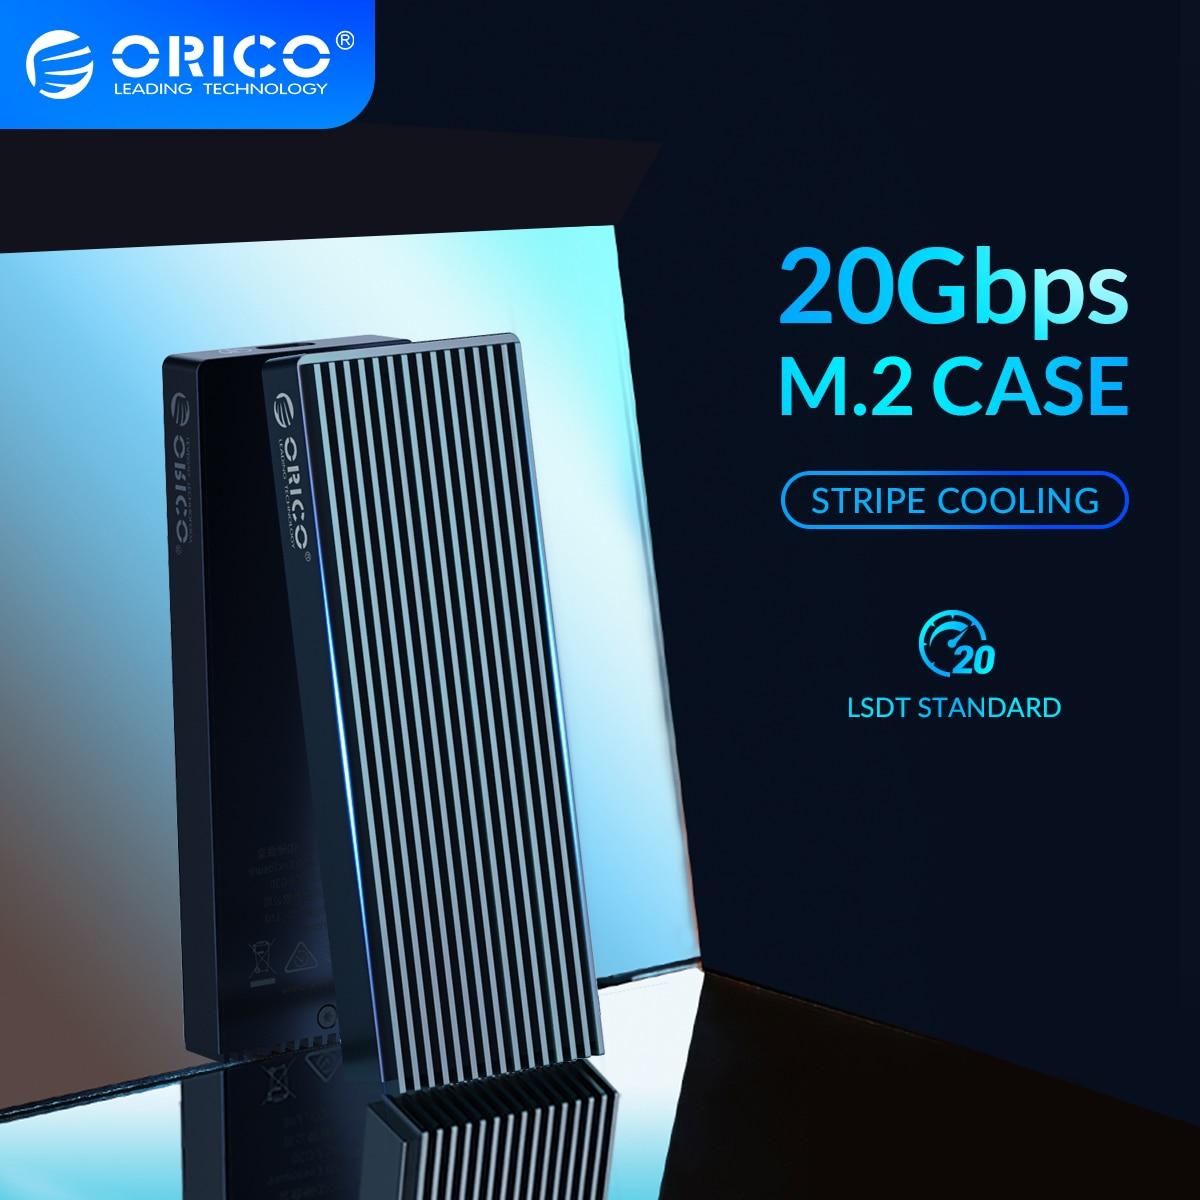 ORICO LSDT M.2 NVME SSD حالة 20 3gbps الألومنيوم M.2 NVME SSD الضميمة USB3.2 GEN2 x2 نوع-C ل M.2 القرص الصلب تصل إلى 2 تيرا بايت C إلى C